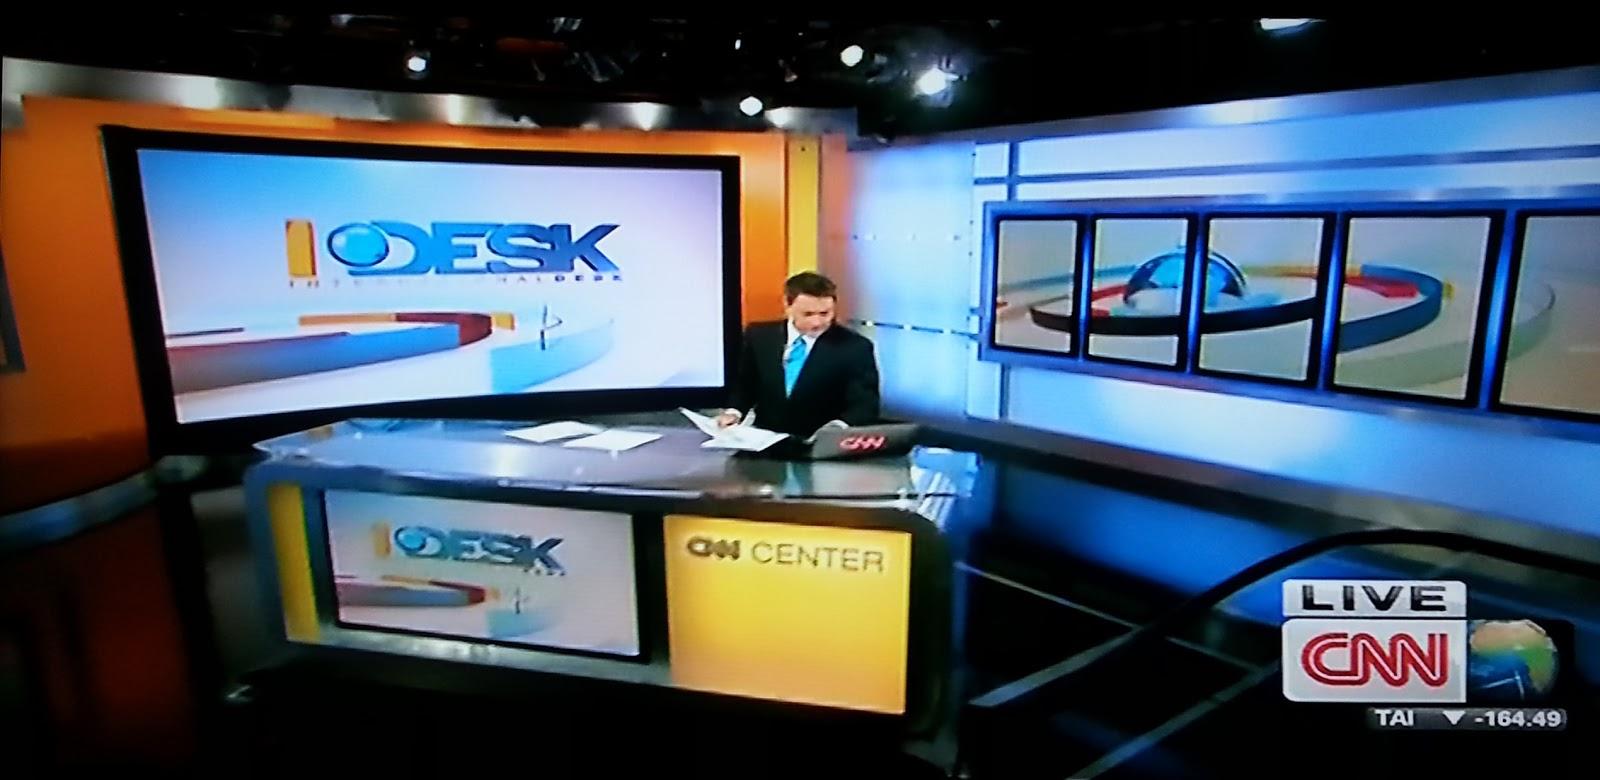 CNN Update: TV With Thinus: International Desk On CNN International